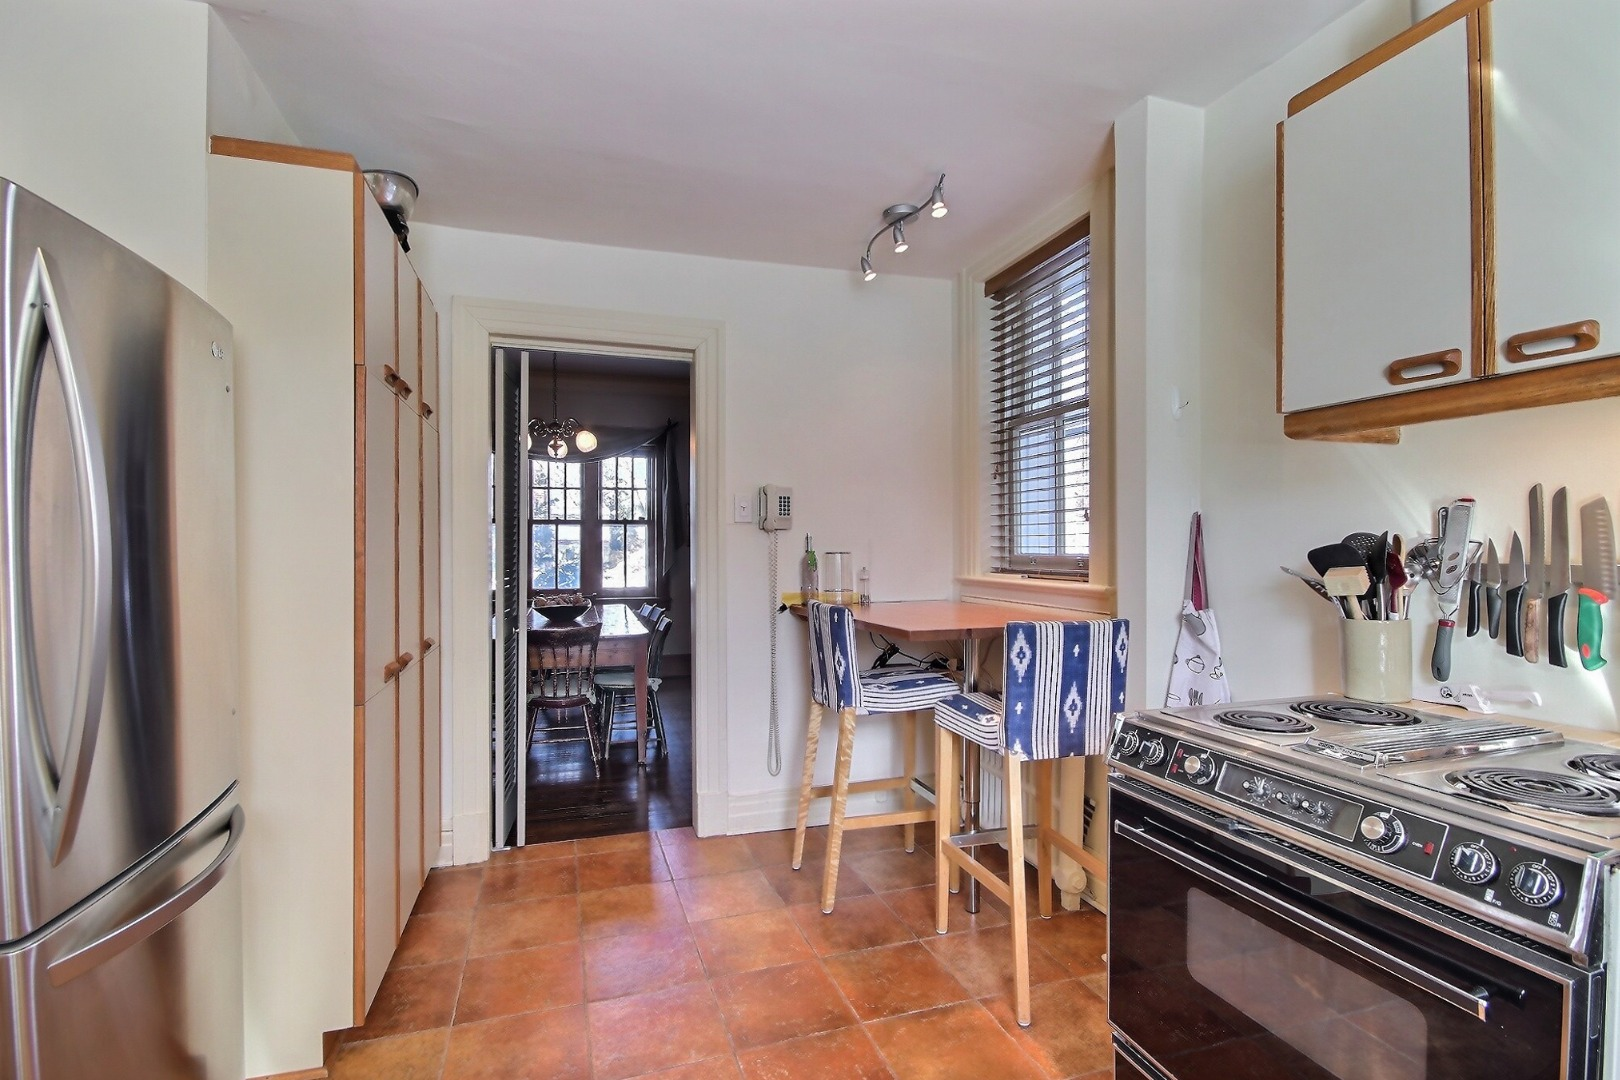 Maison_a_vendre_70,_Avenue_Kindersley,_Mont-Royal-12.jpg